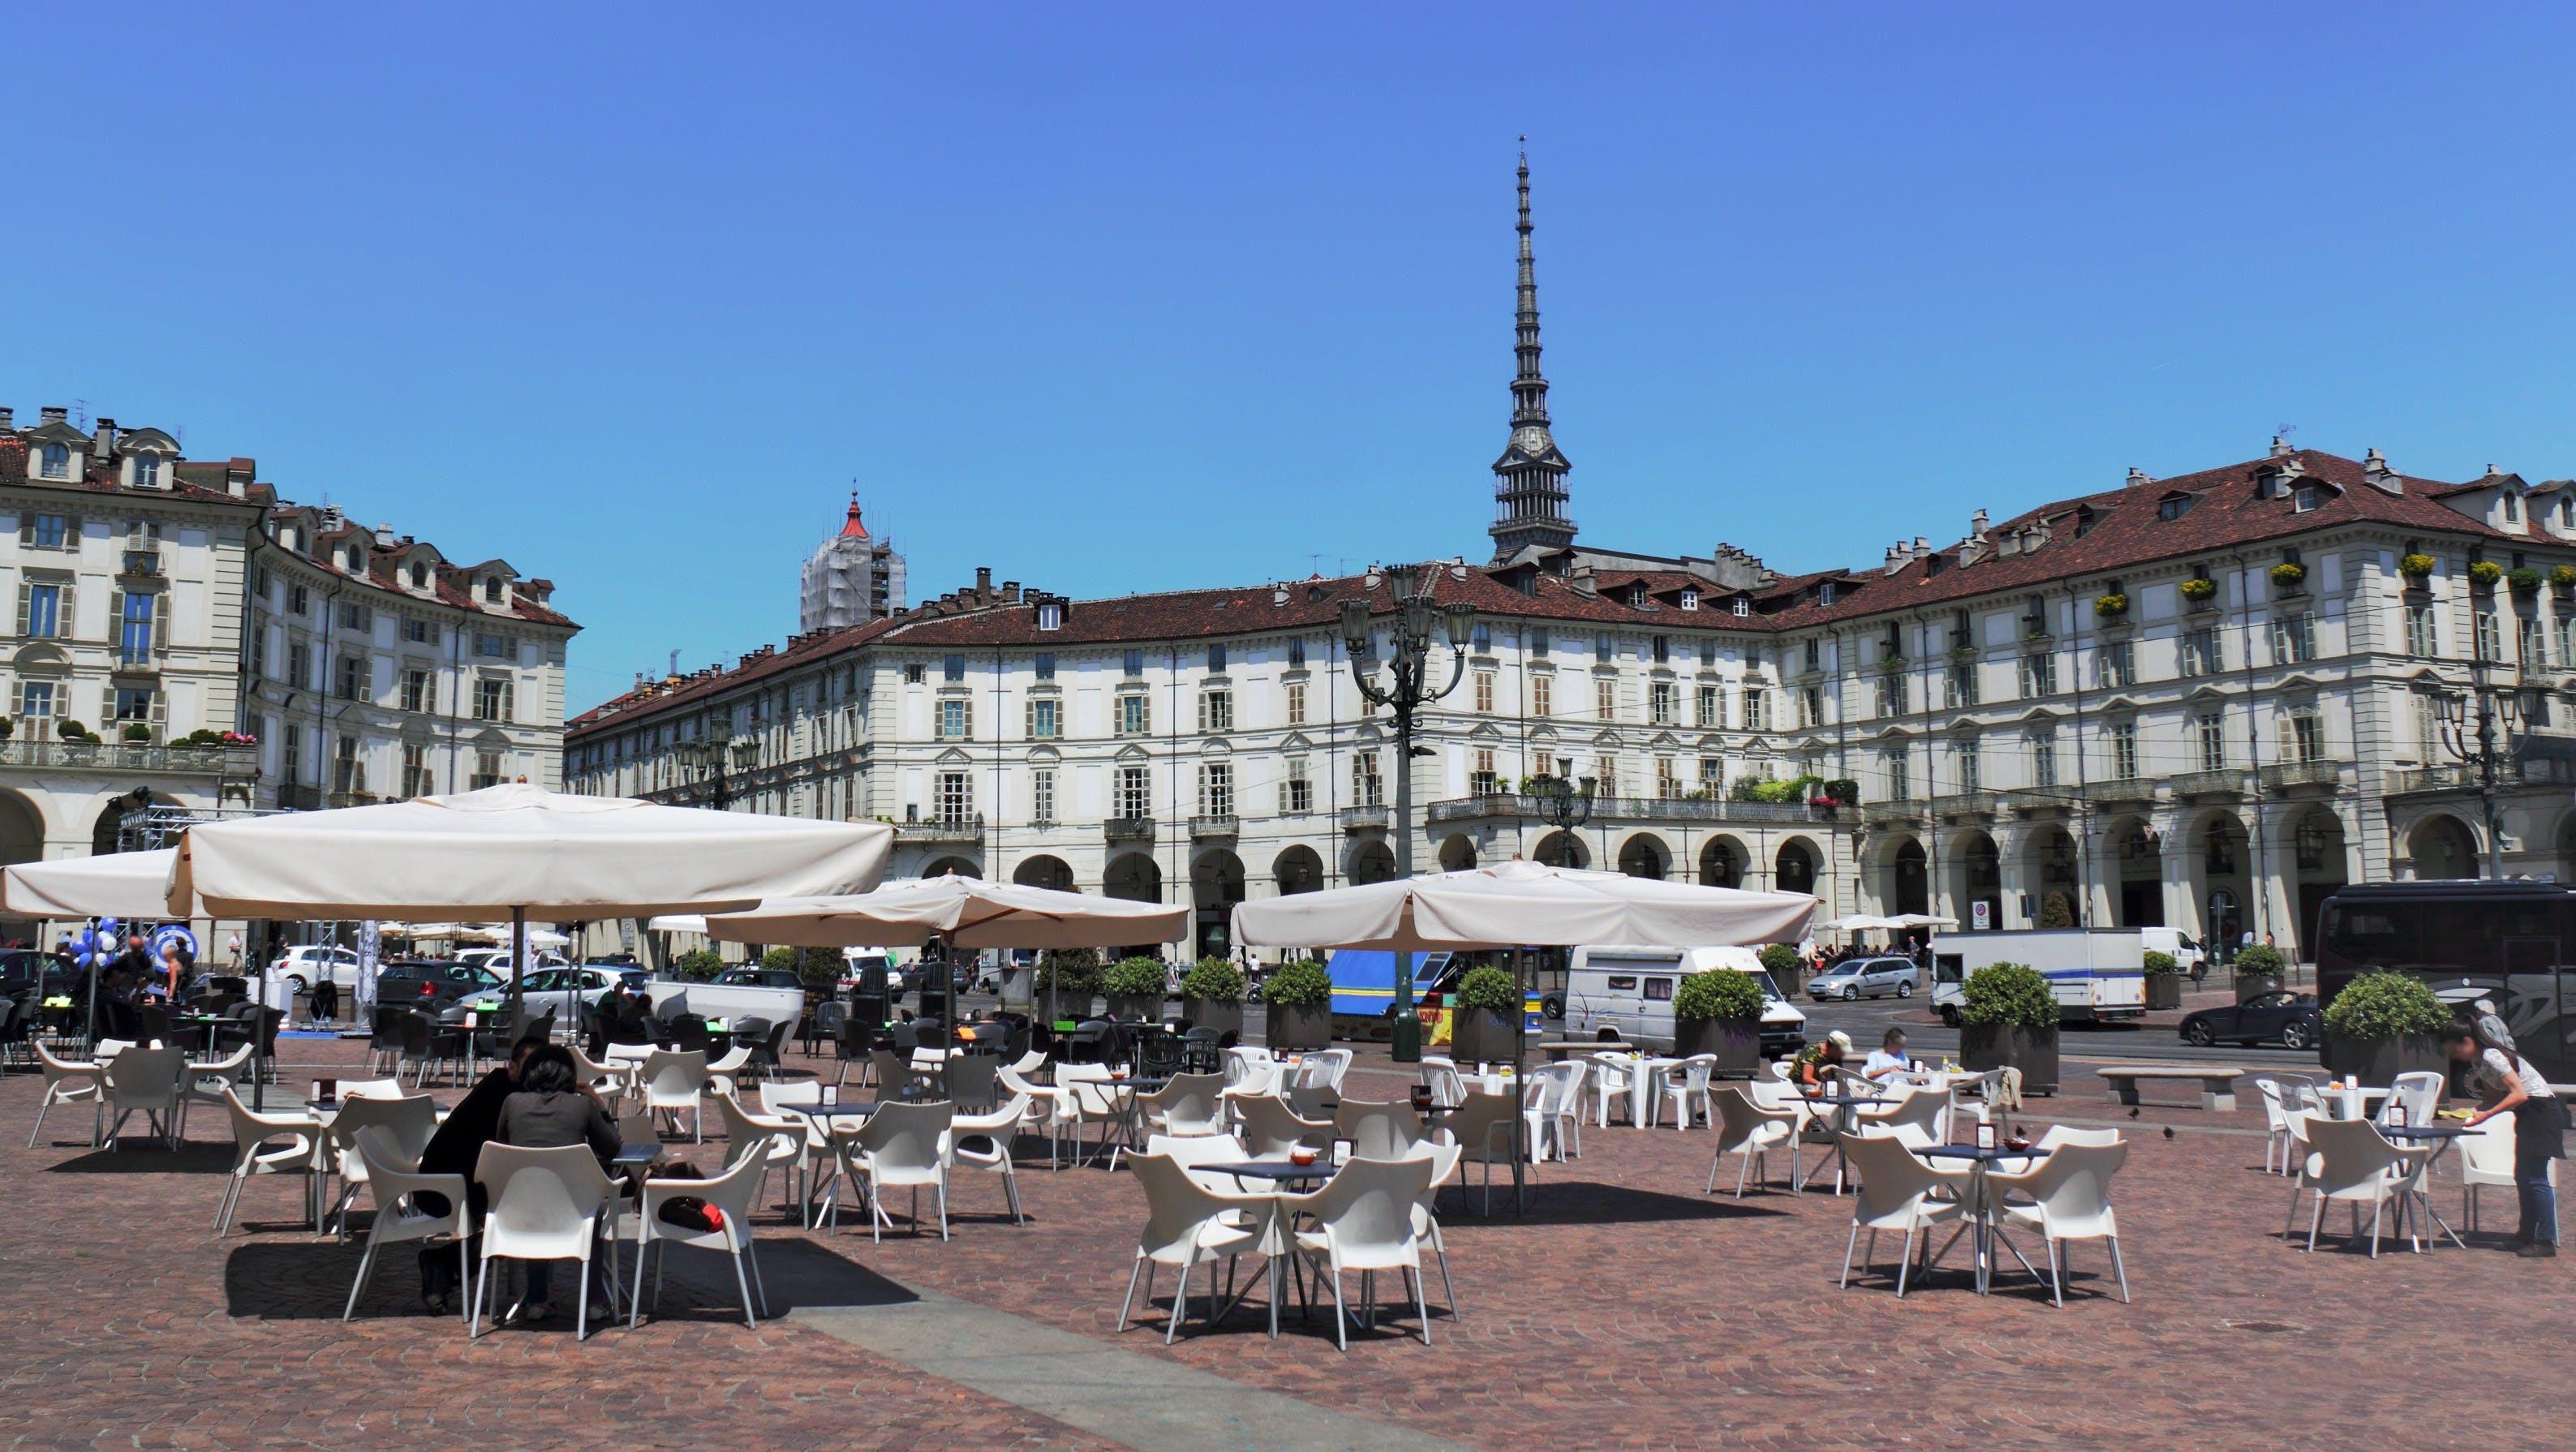 Piazza_Torino_Fotolia.jpg café